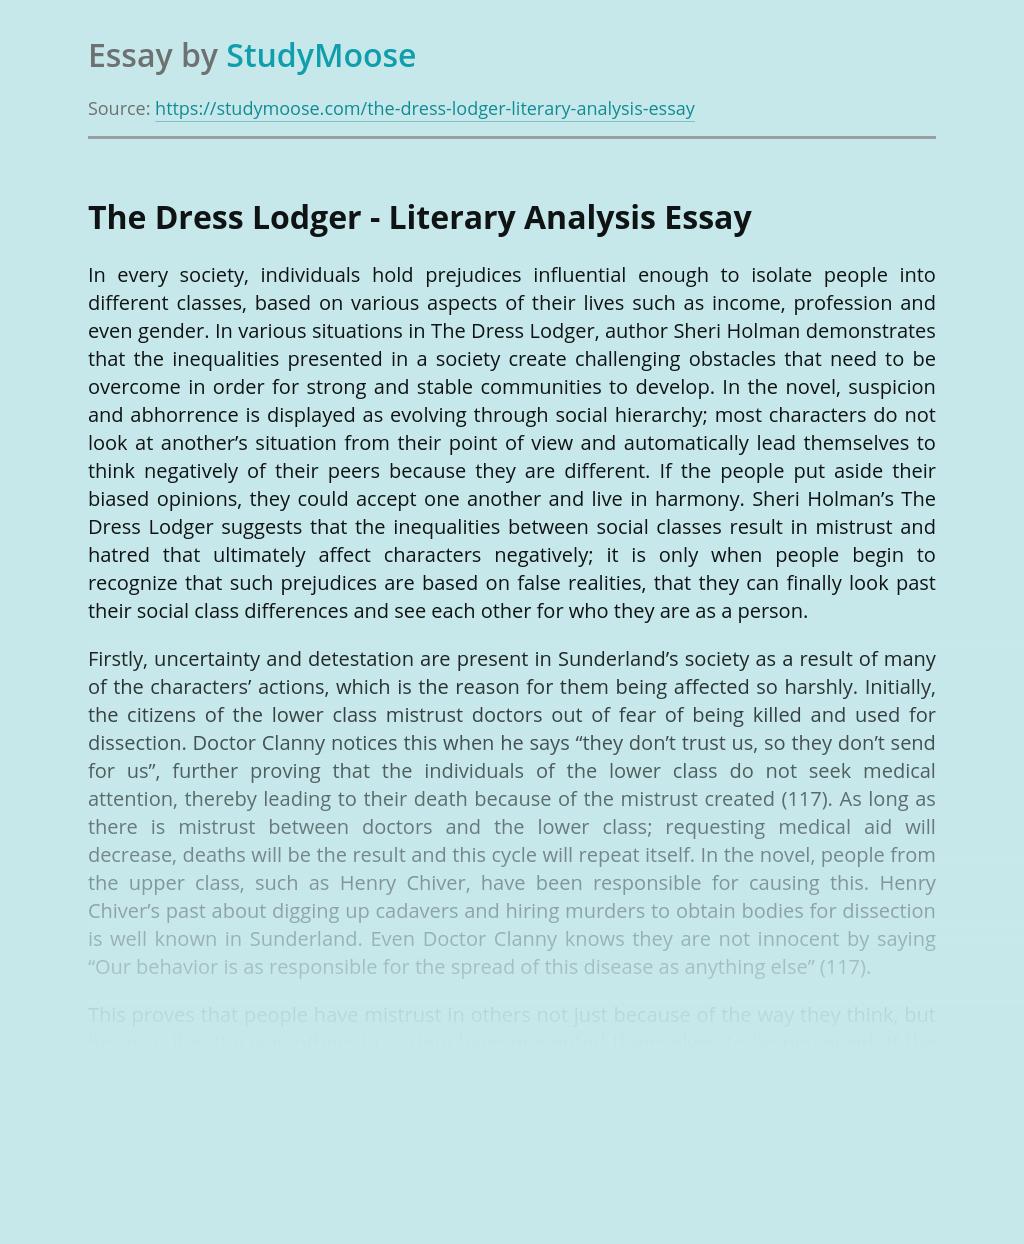 The Dress Lodger by Sheri Holman - Literary Analysis